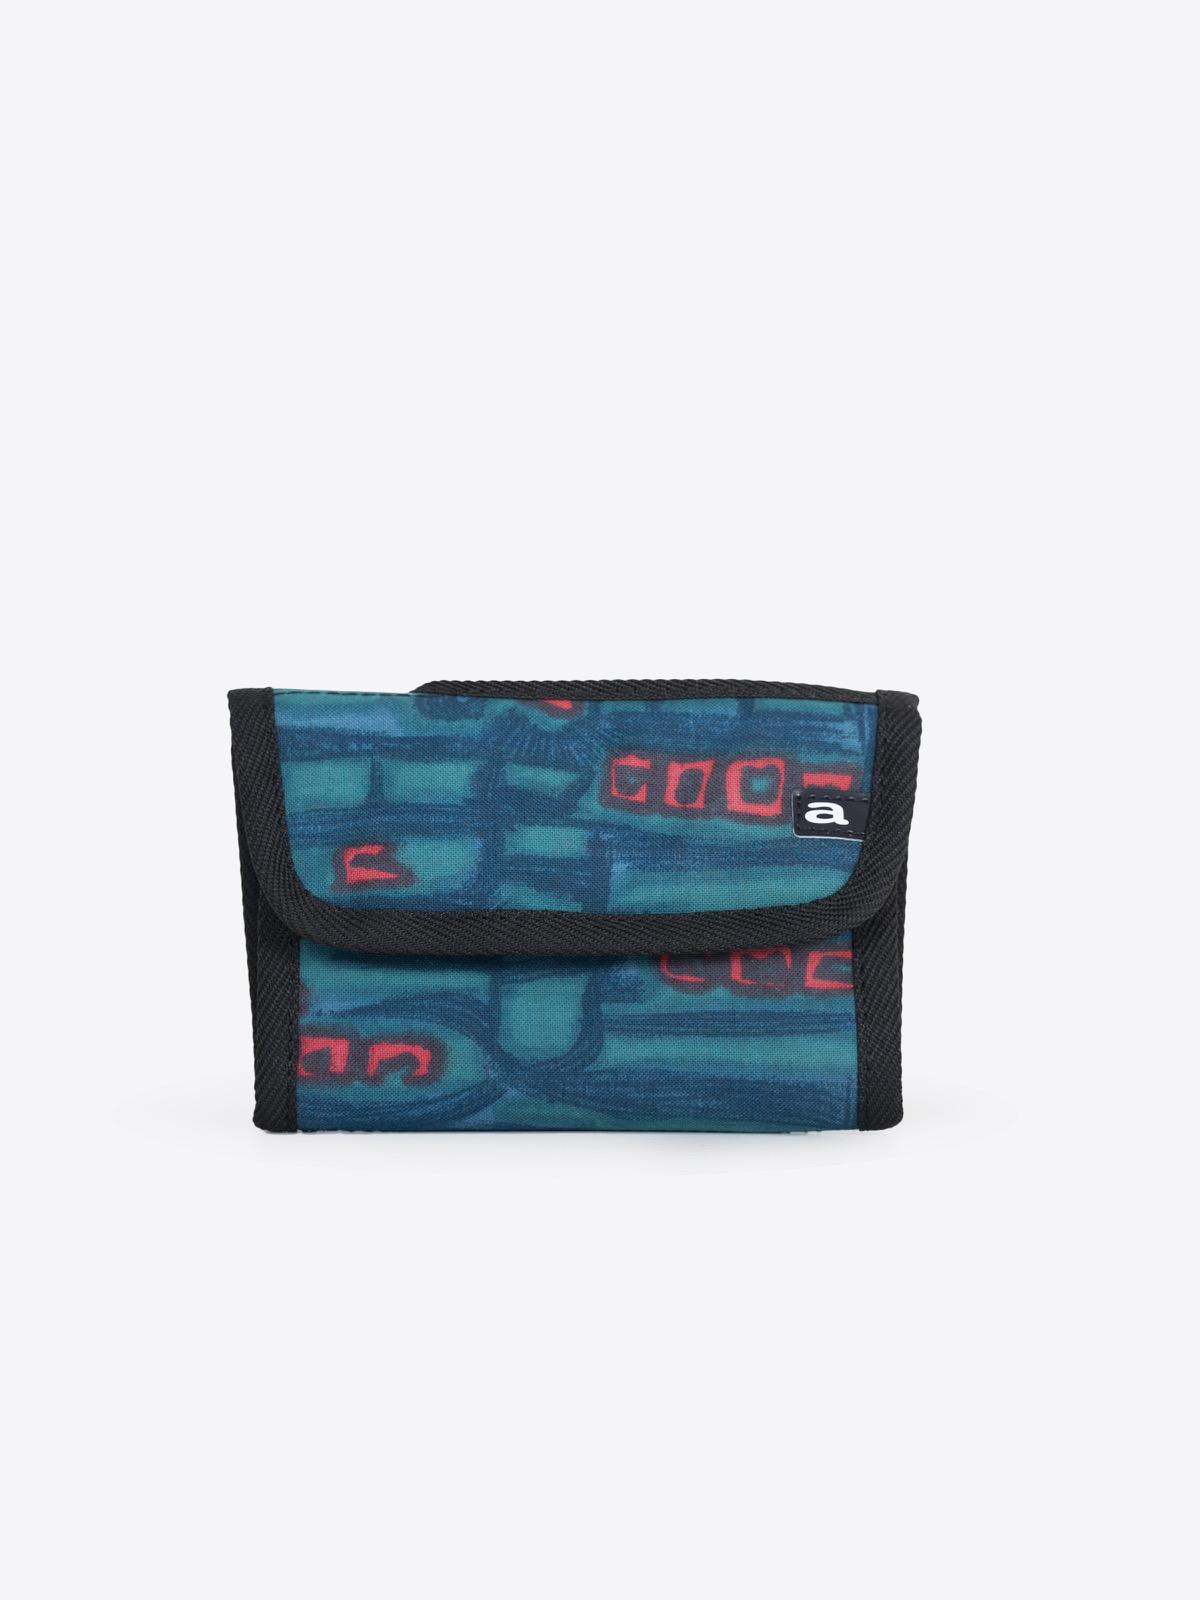 airbag craftworks palermo   347